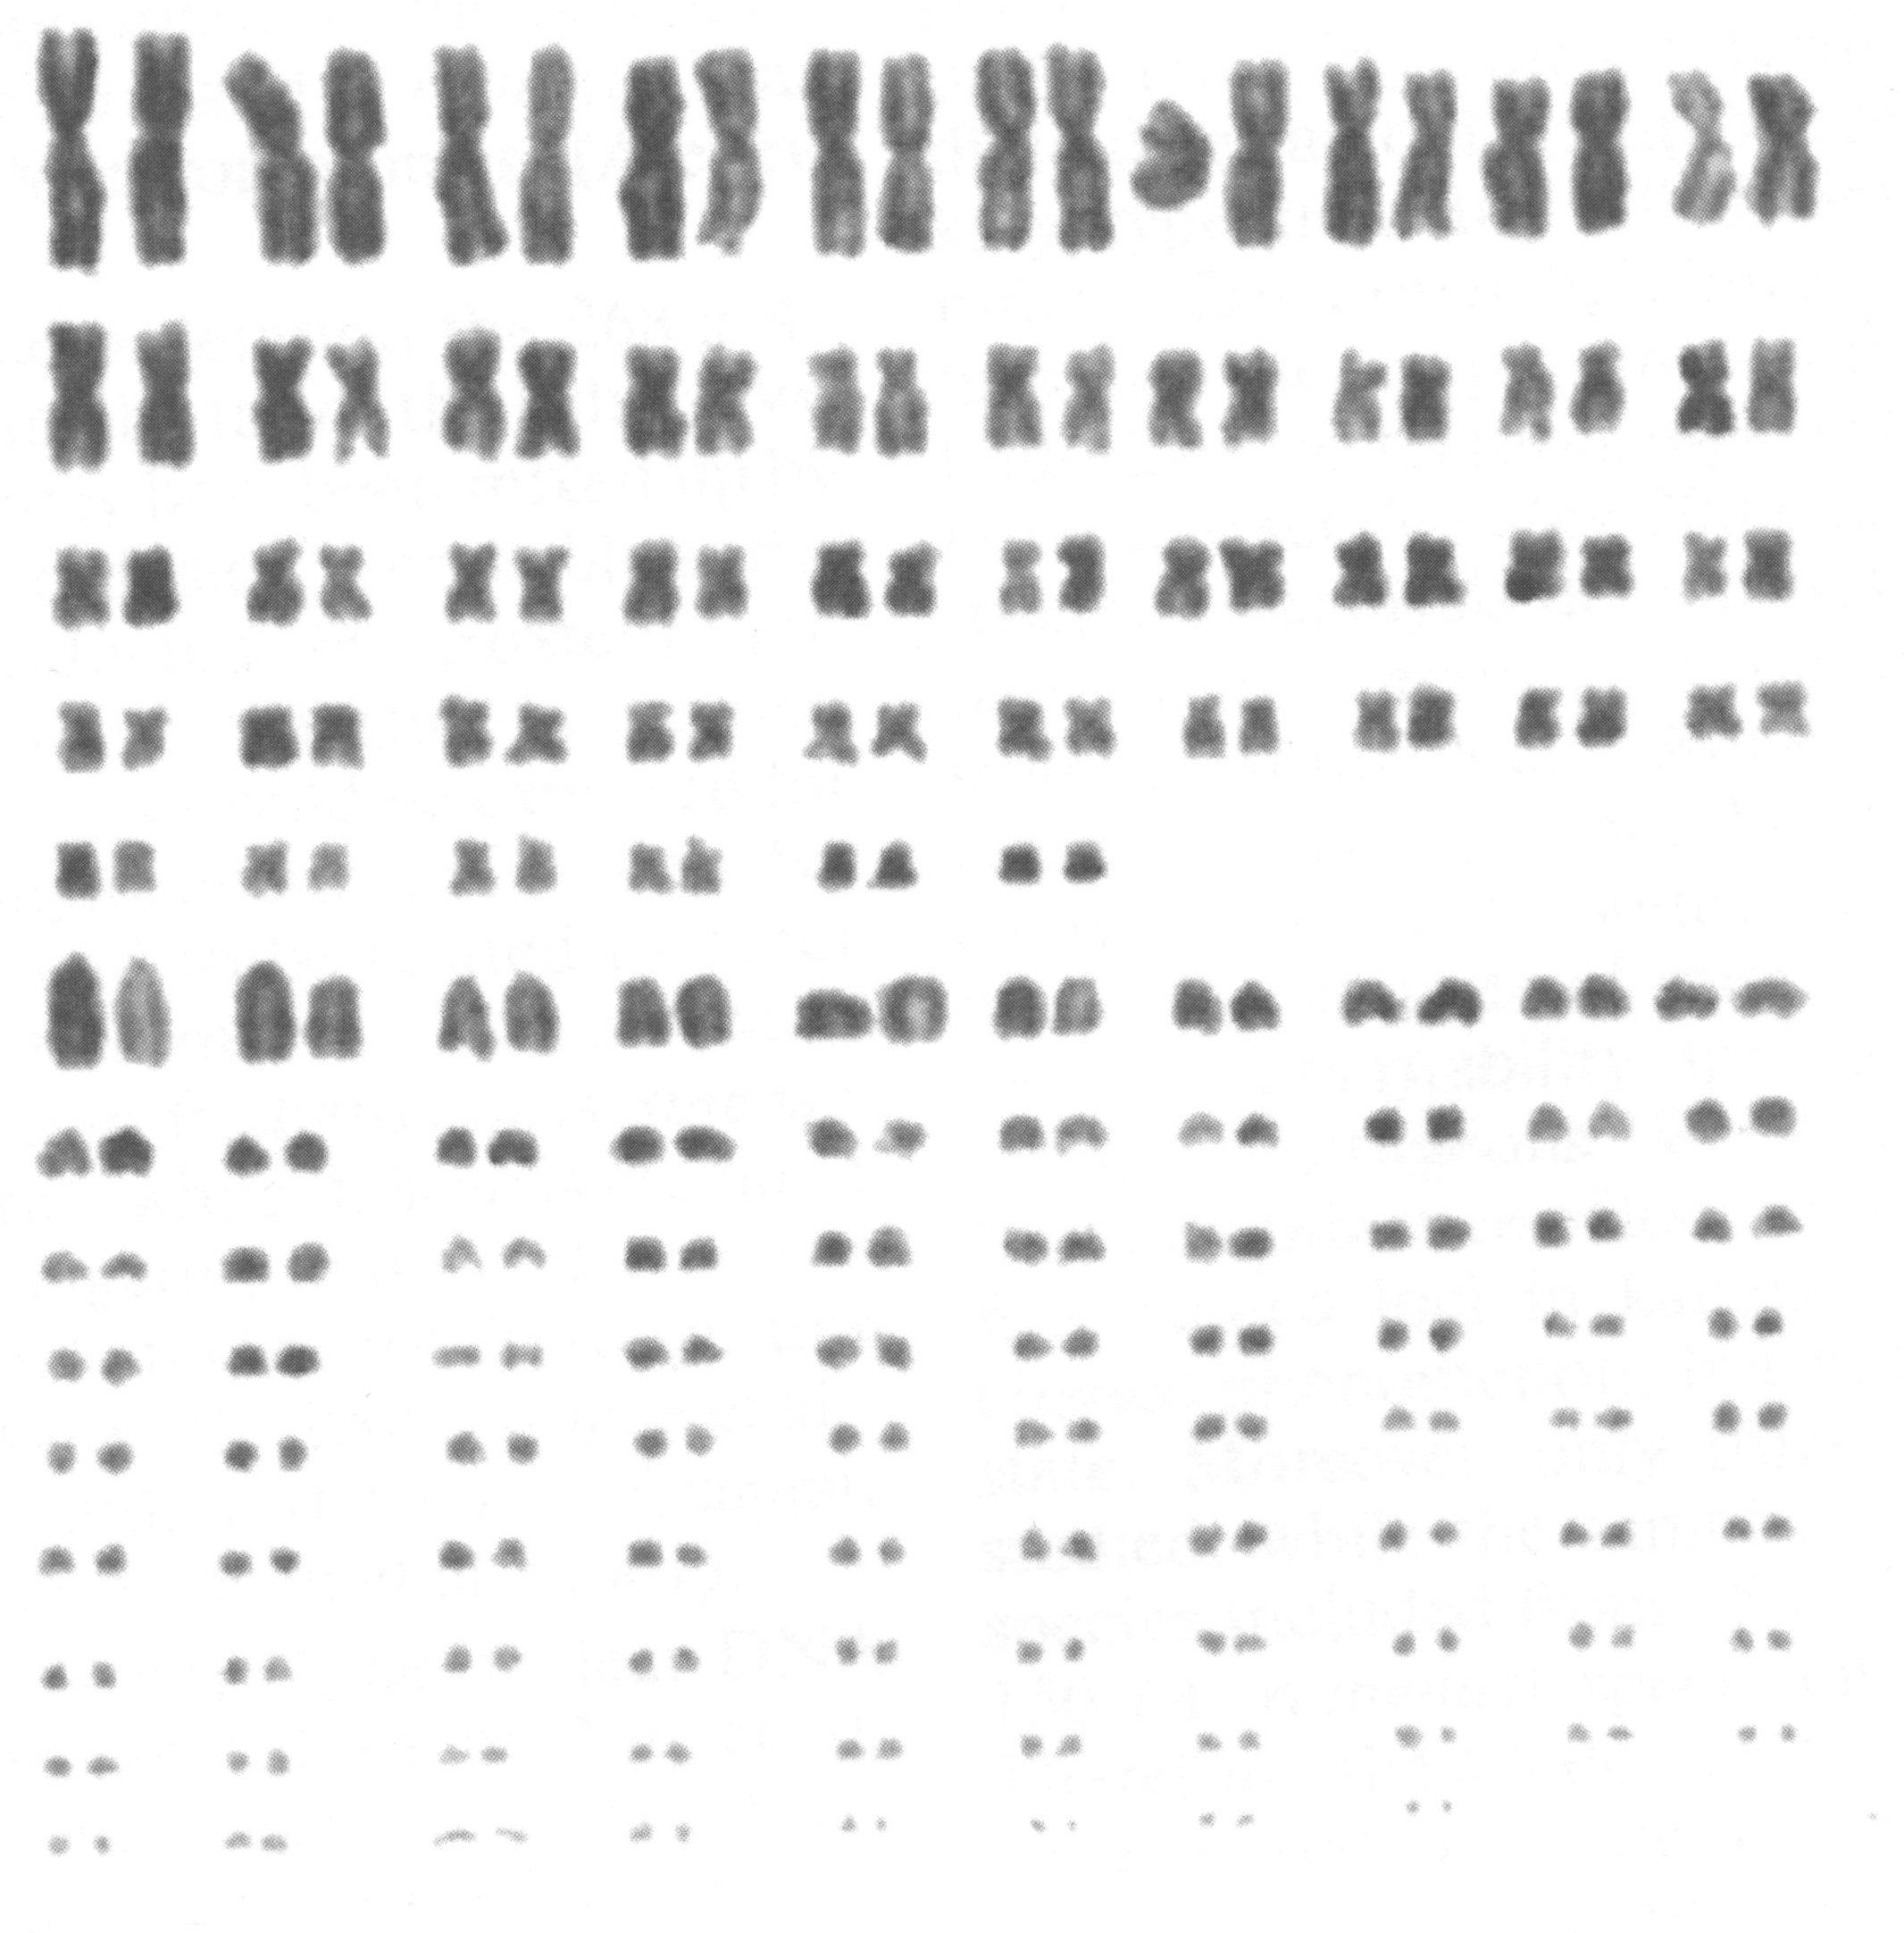 copy_of_schrencki001.jpg